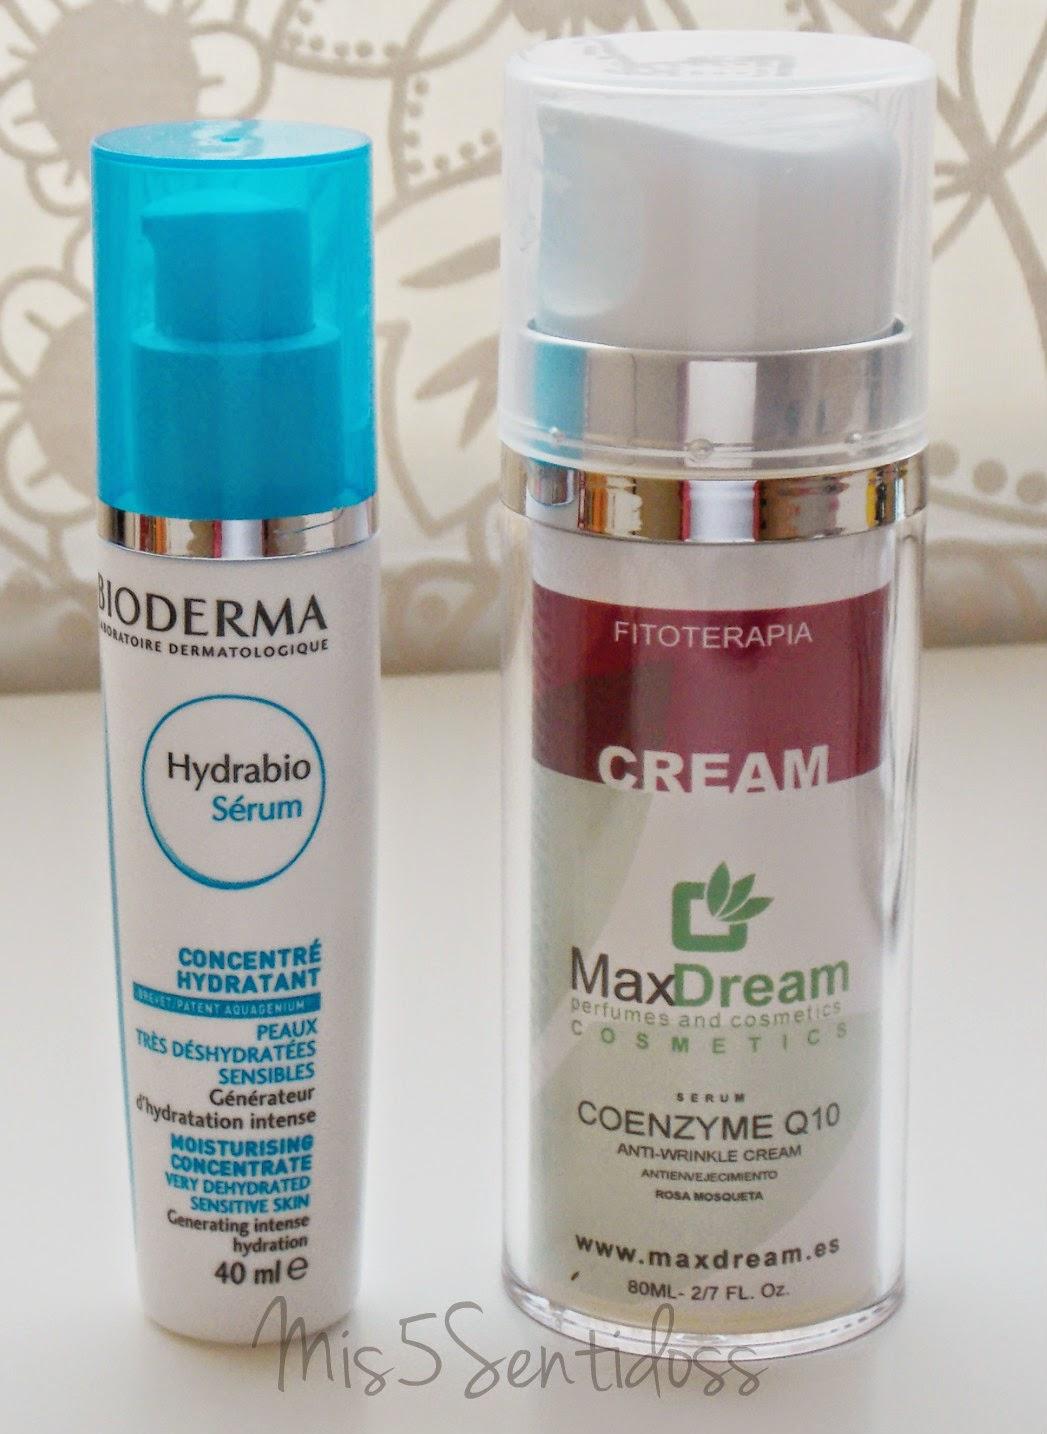 Bioderma Hydrabio & Max Dreams Coenzyme Q10